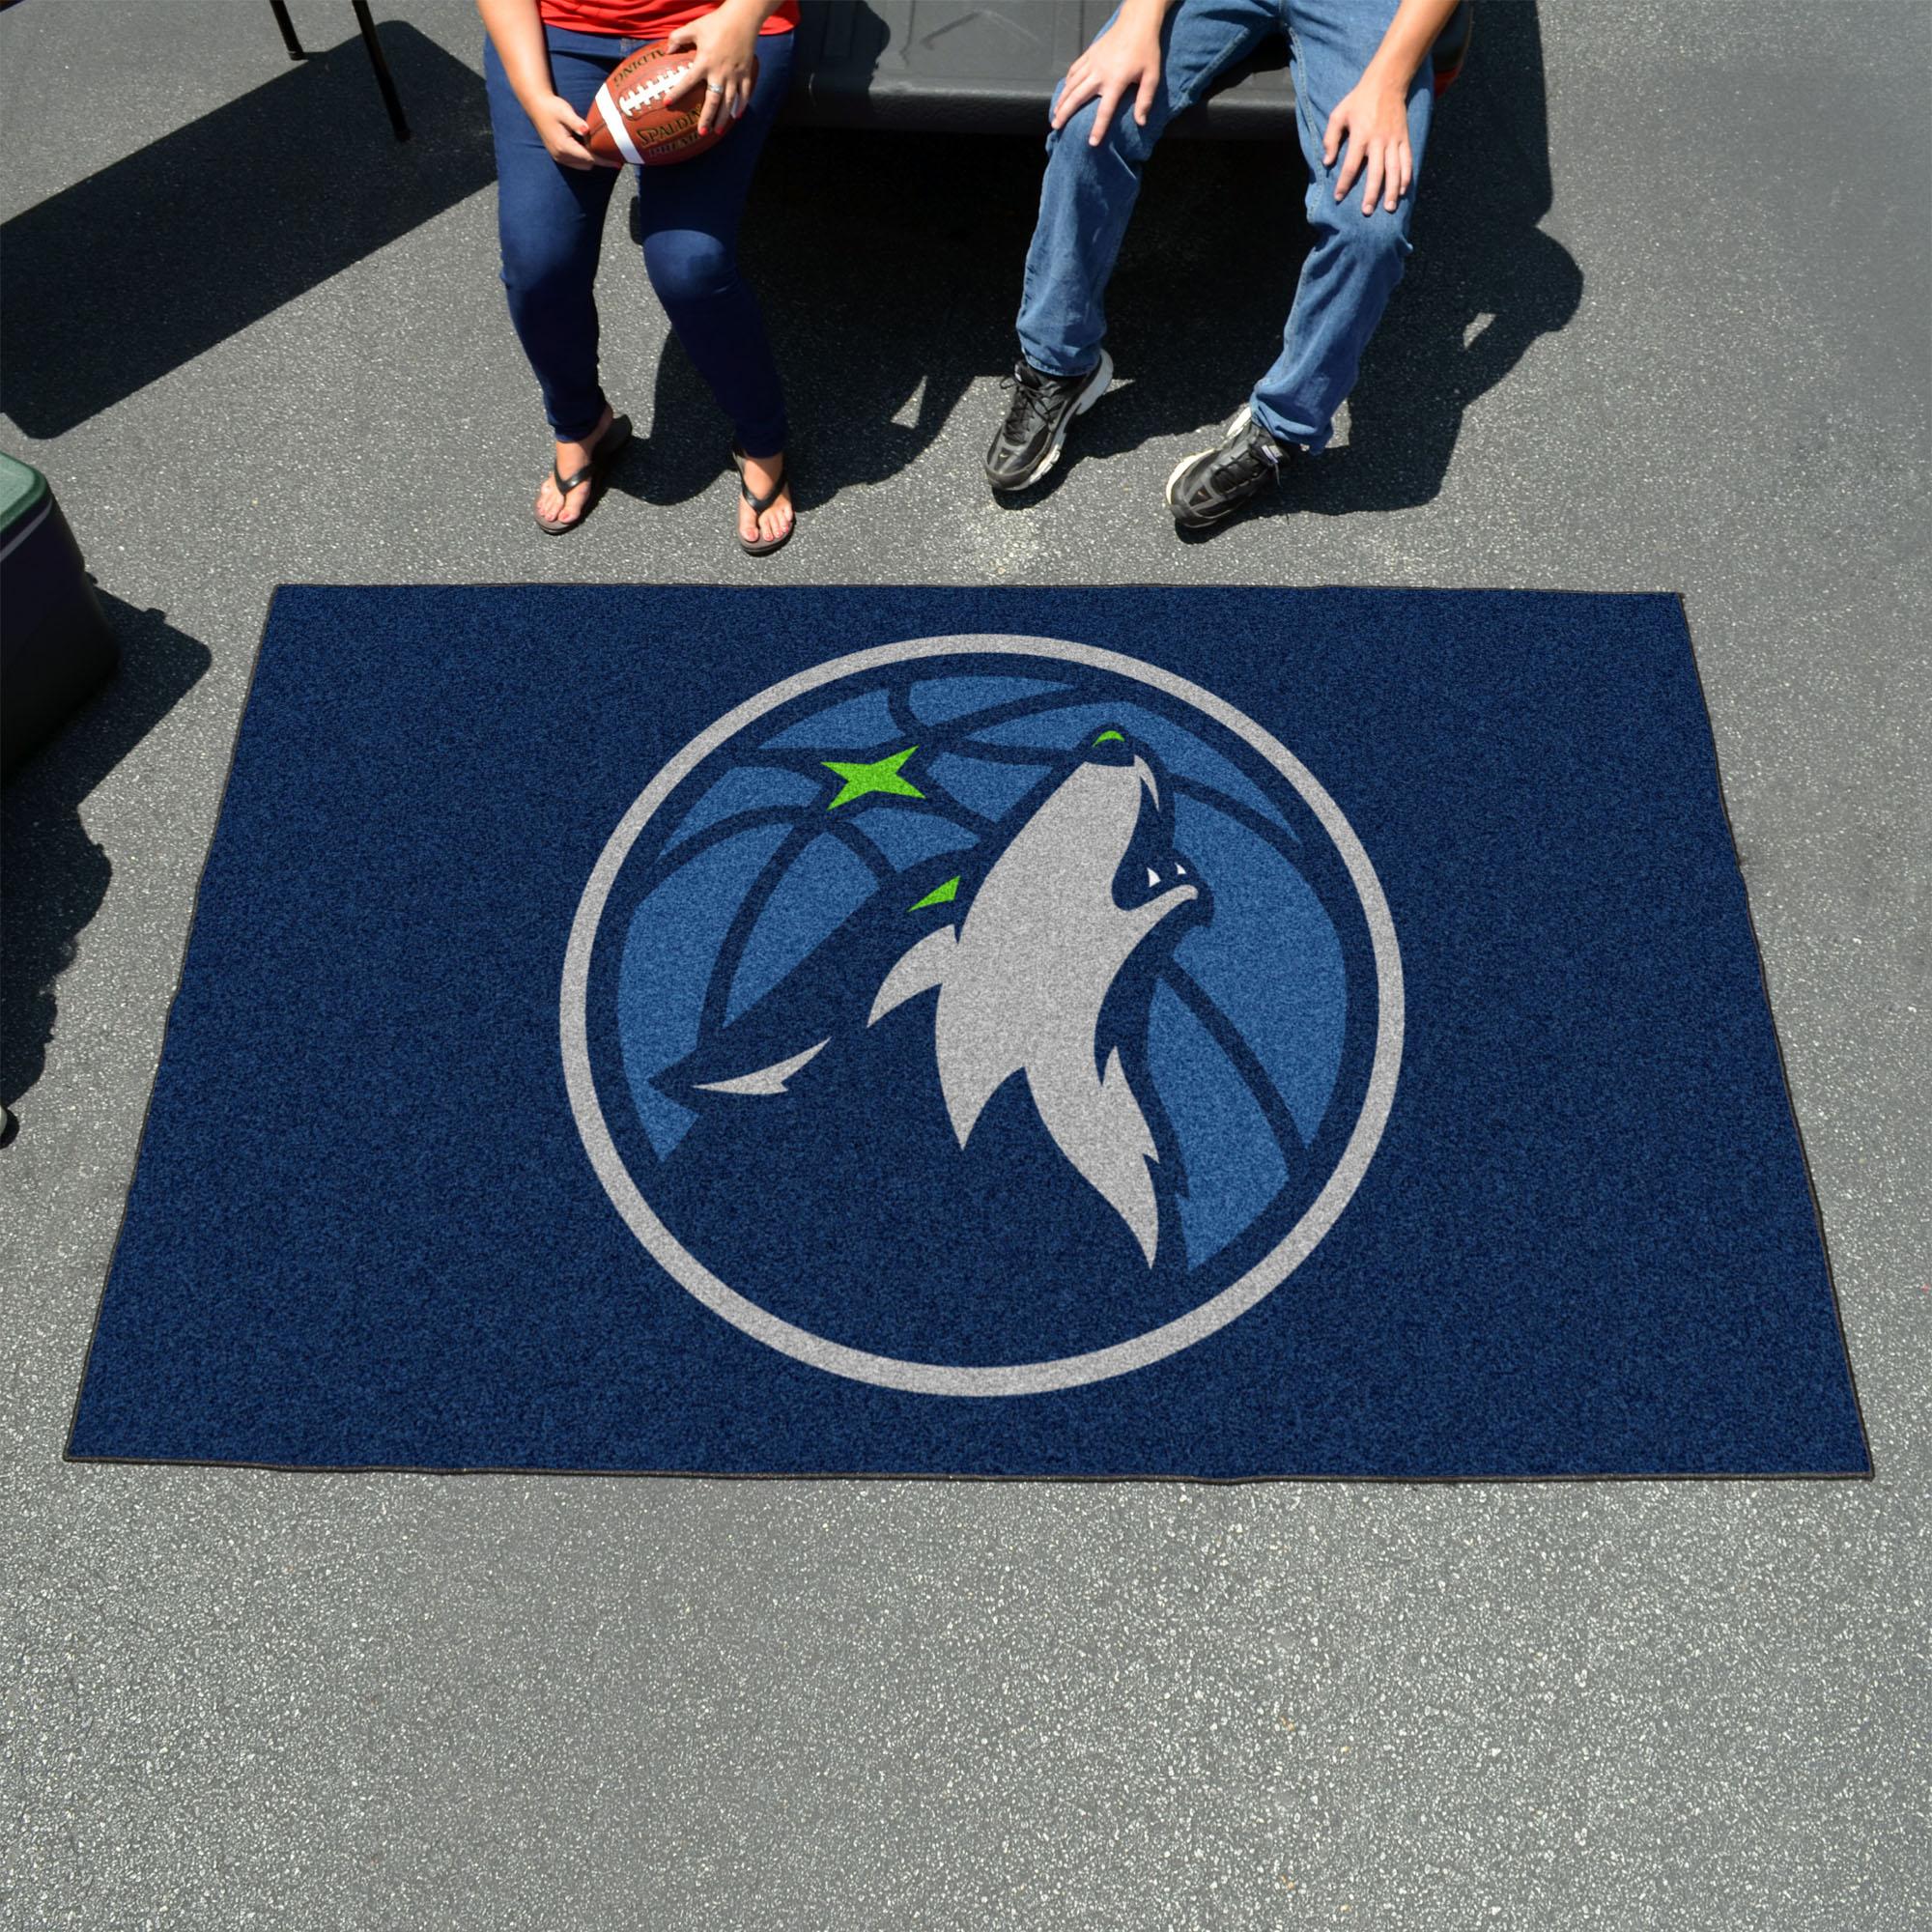 Buy Minnesota Timberwolves Merchandise At The Minnesota